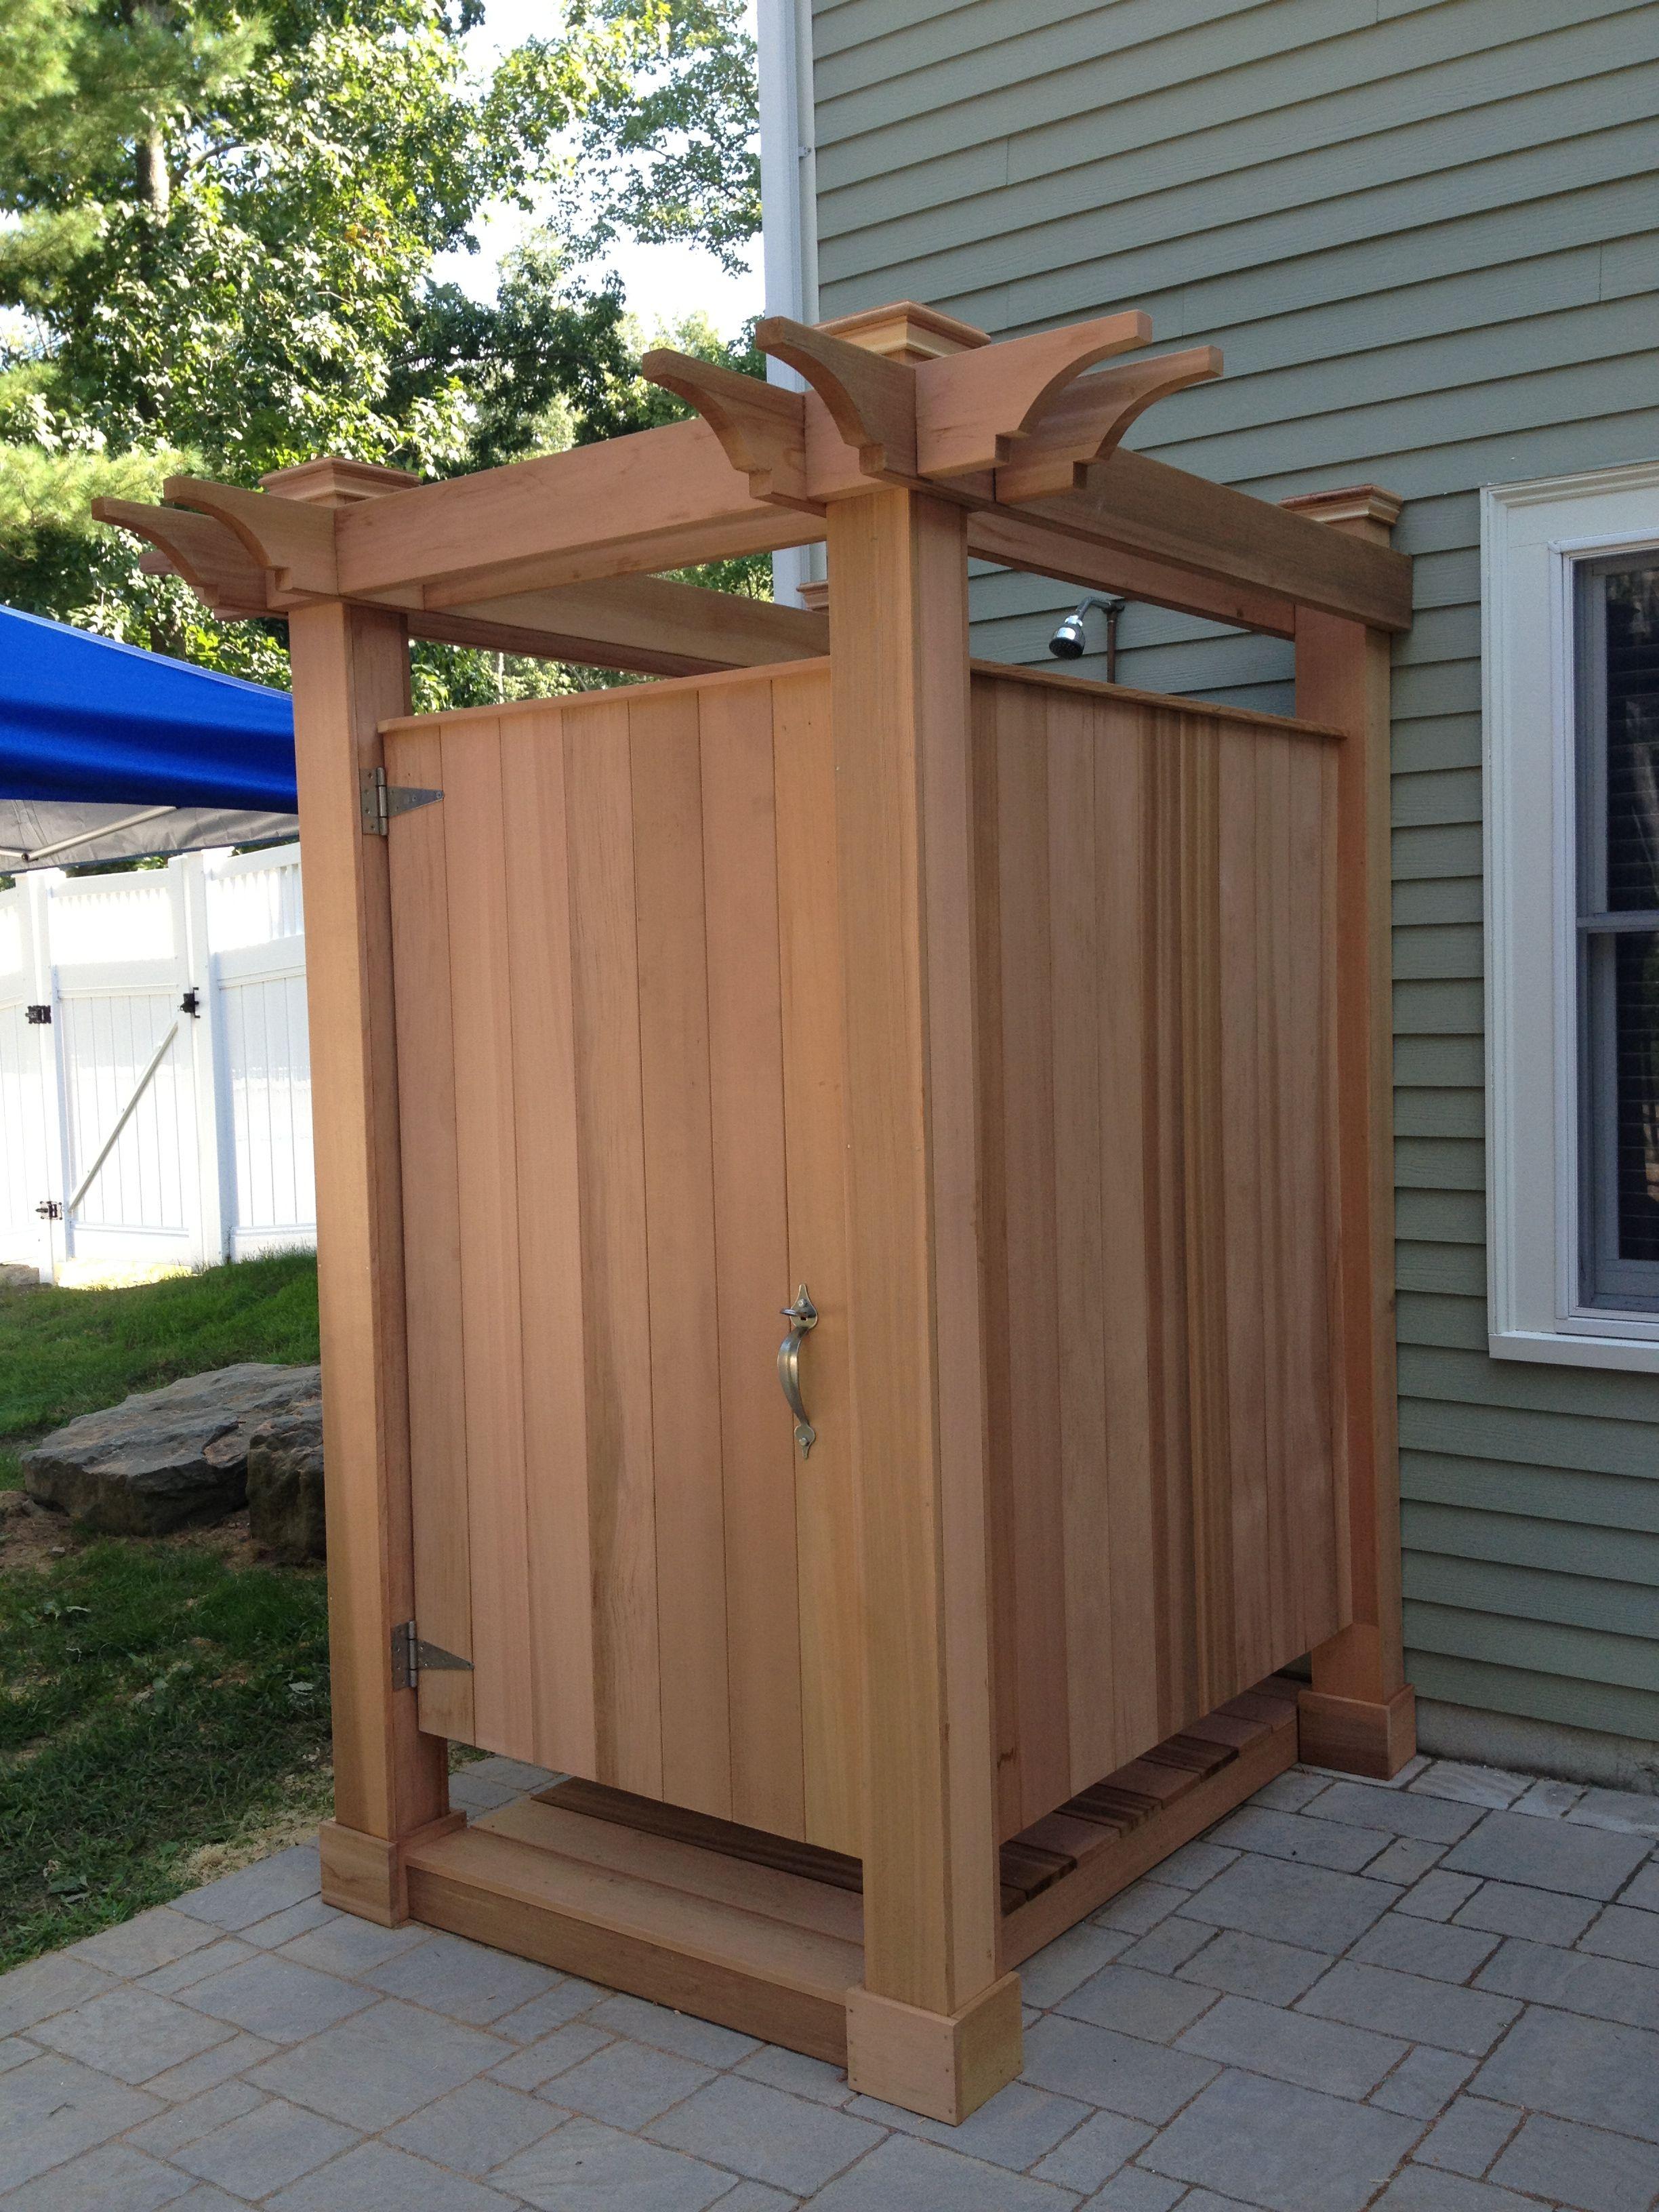 Red Cedar Outdoor Shower By Jkshea Construction Jkshea